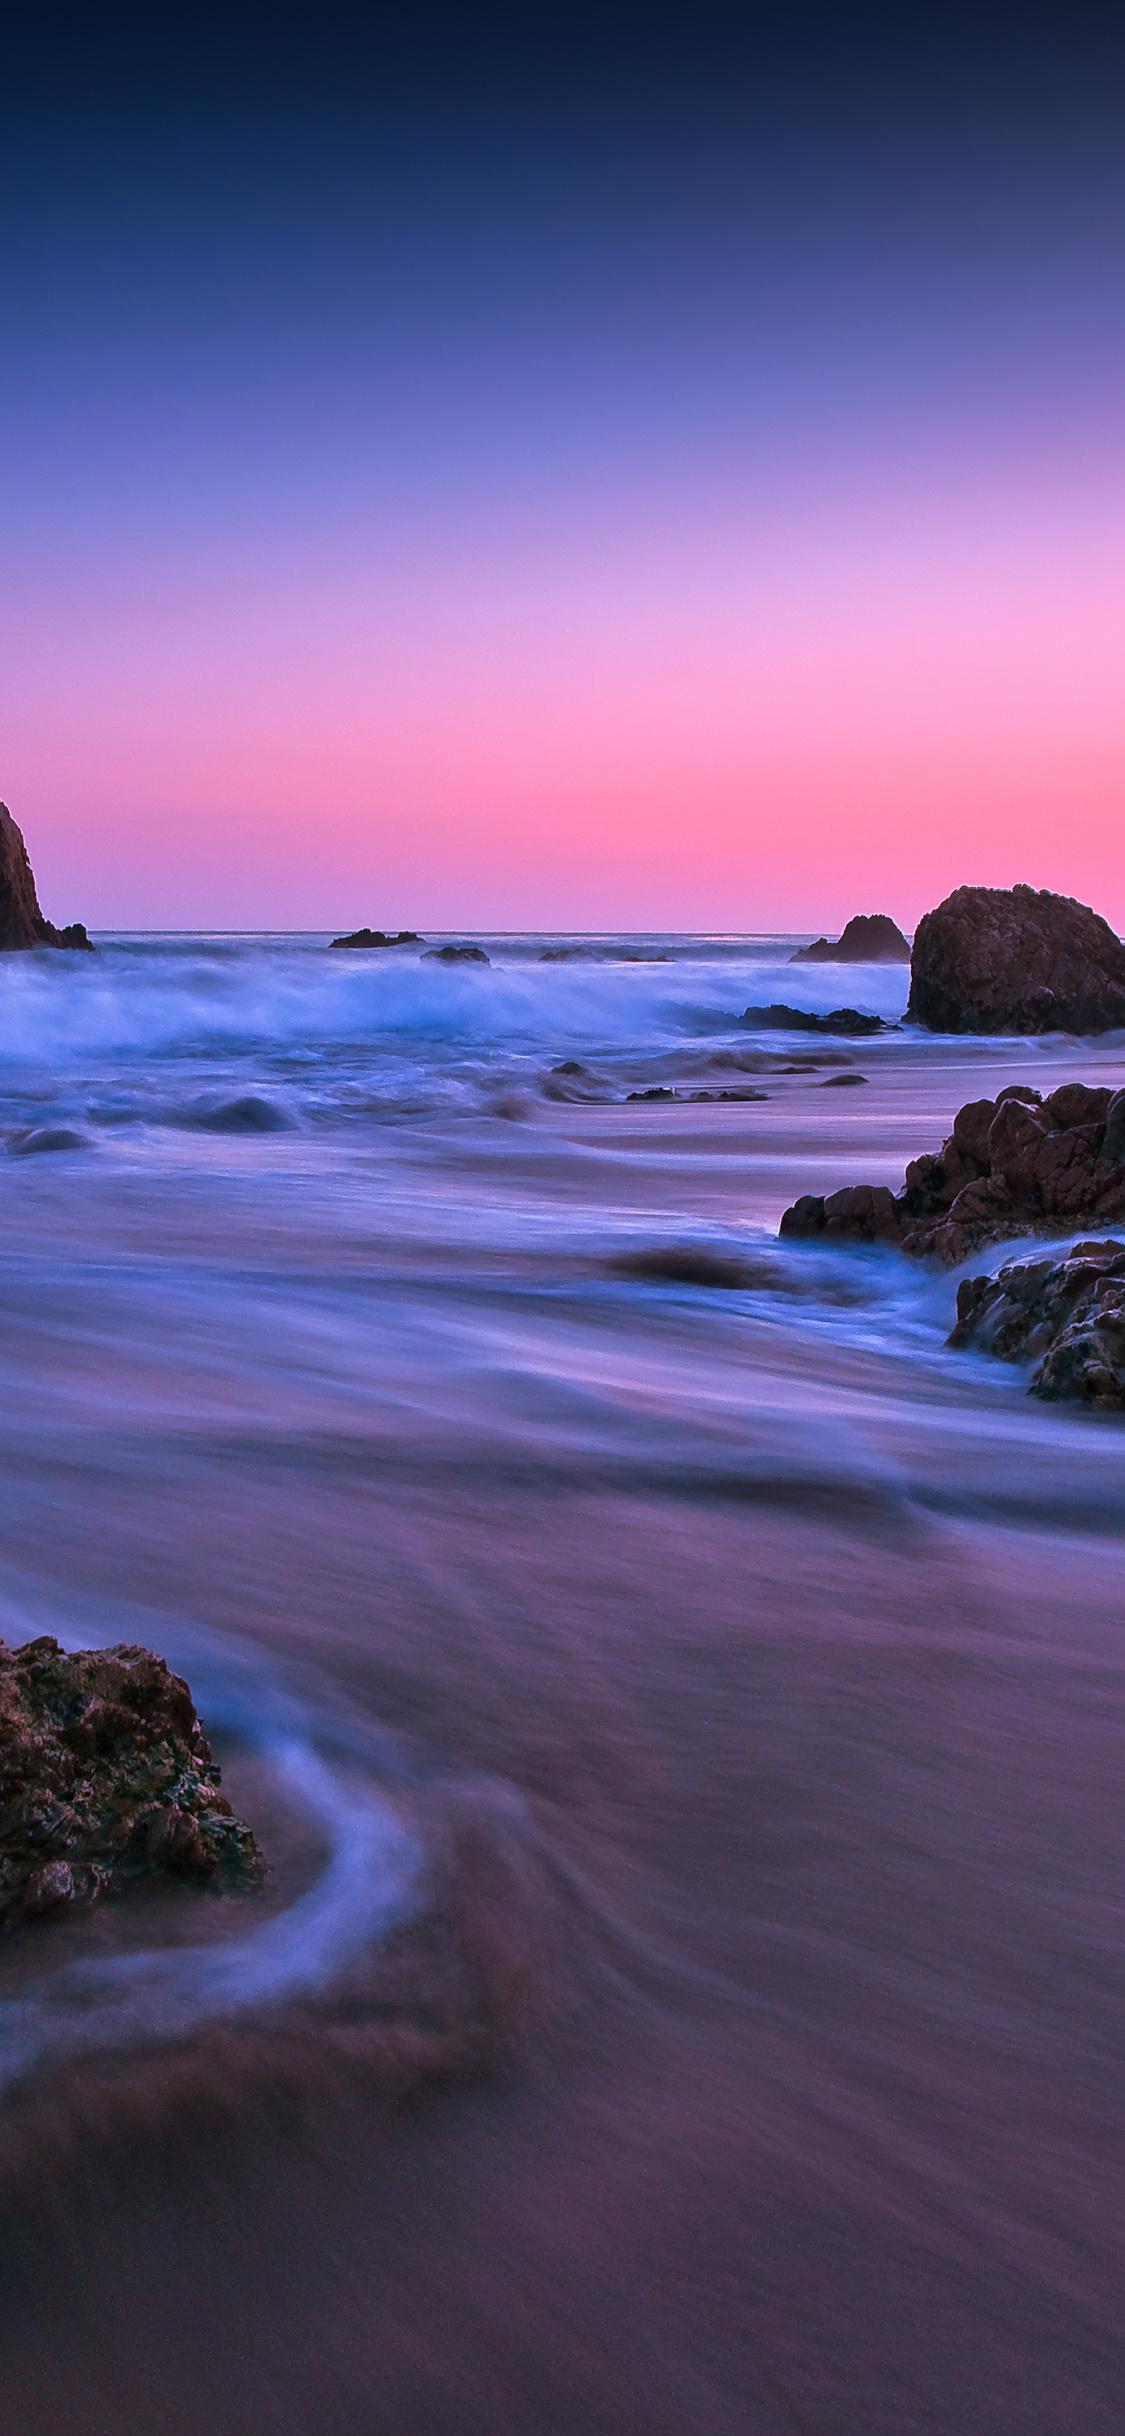 earth-ocean-rock-sunset-long-exposure-5k-2z.jpg